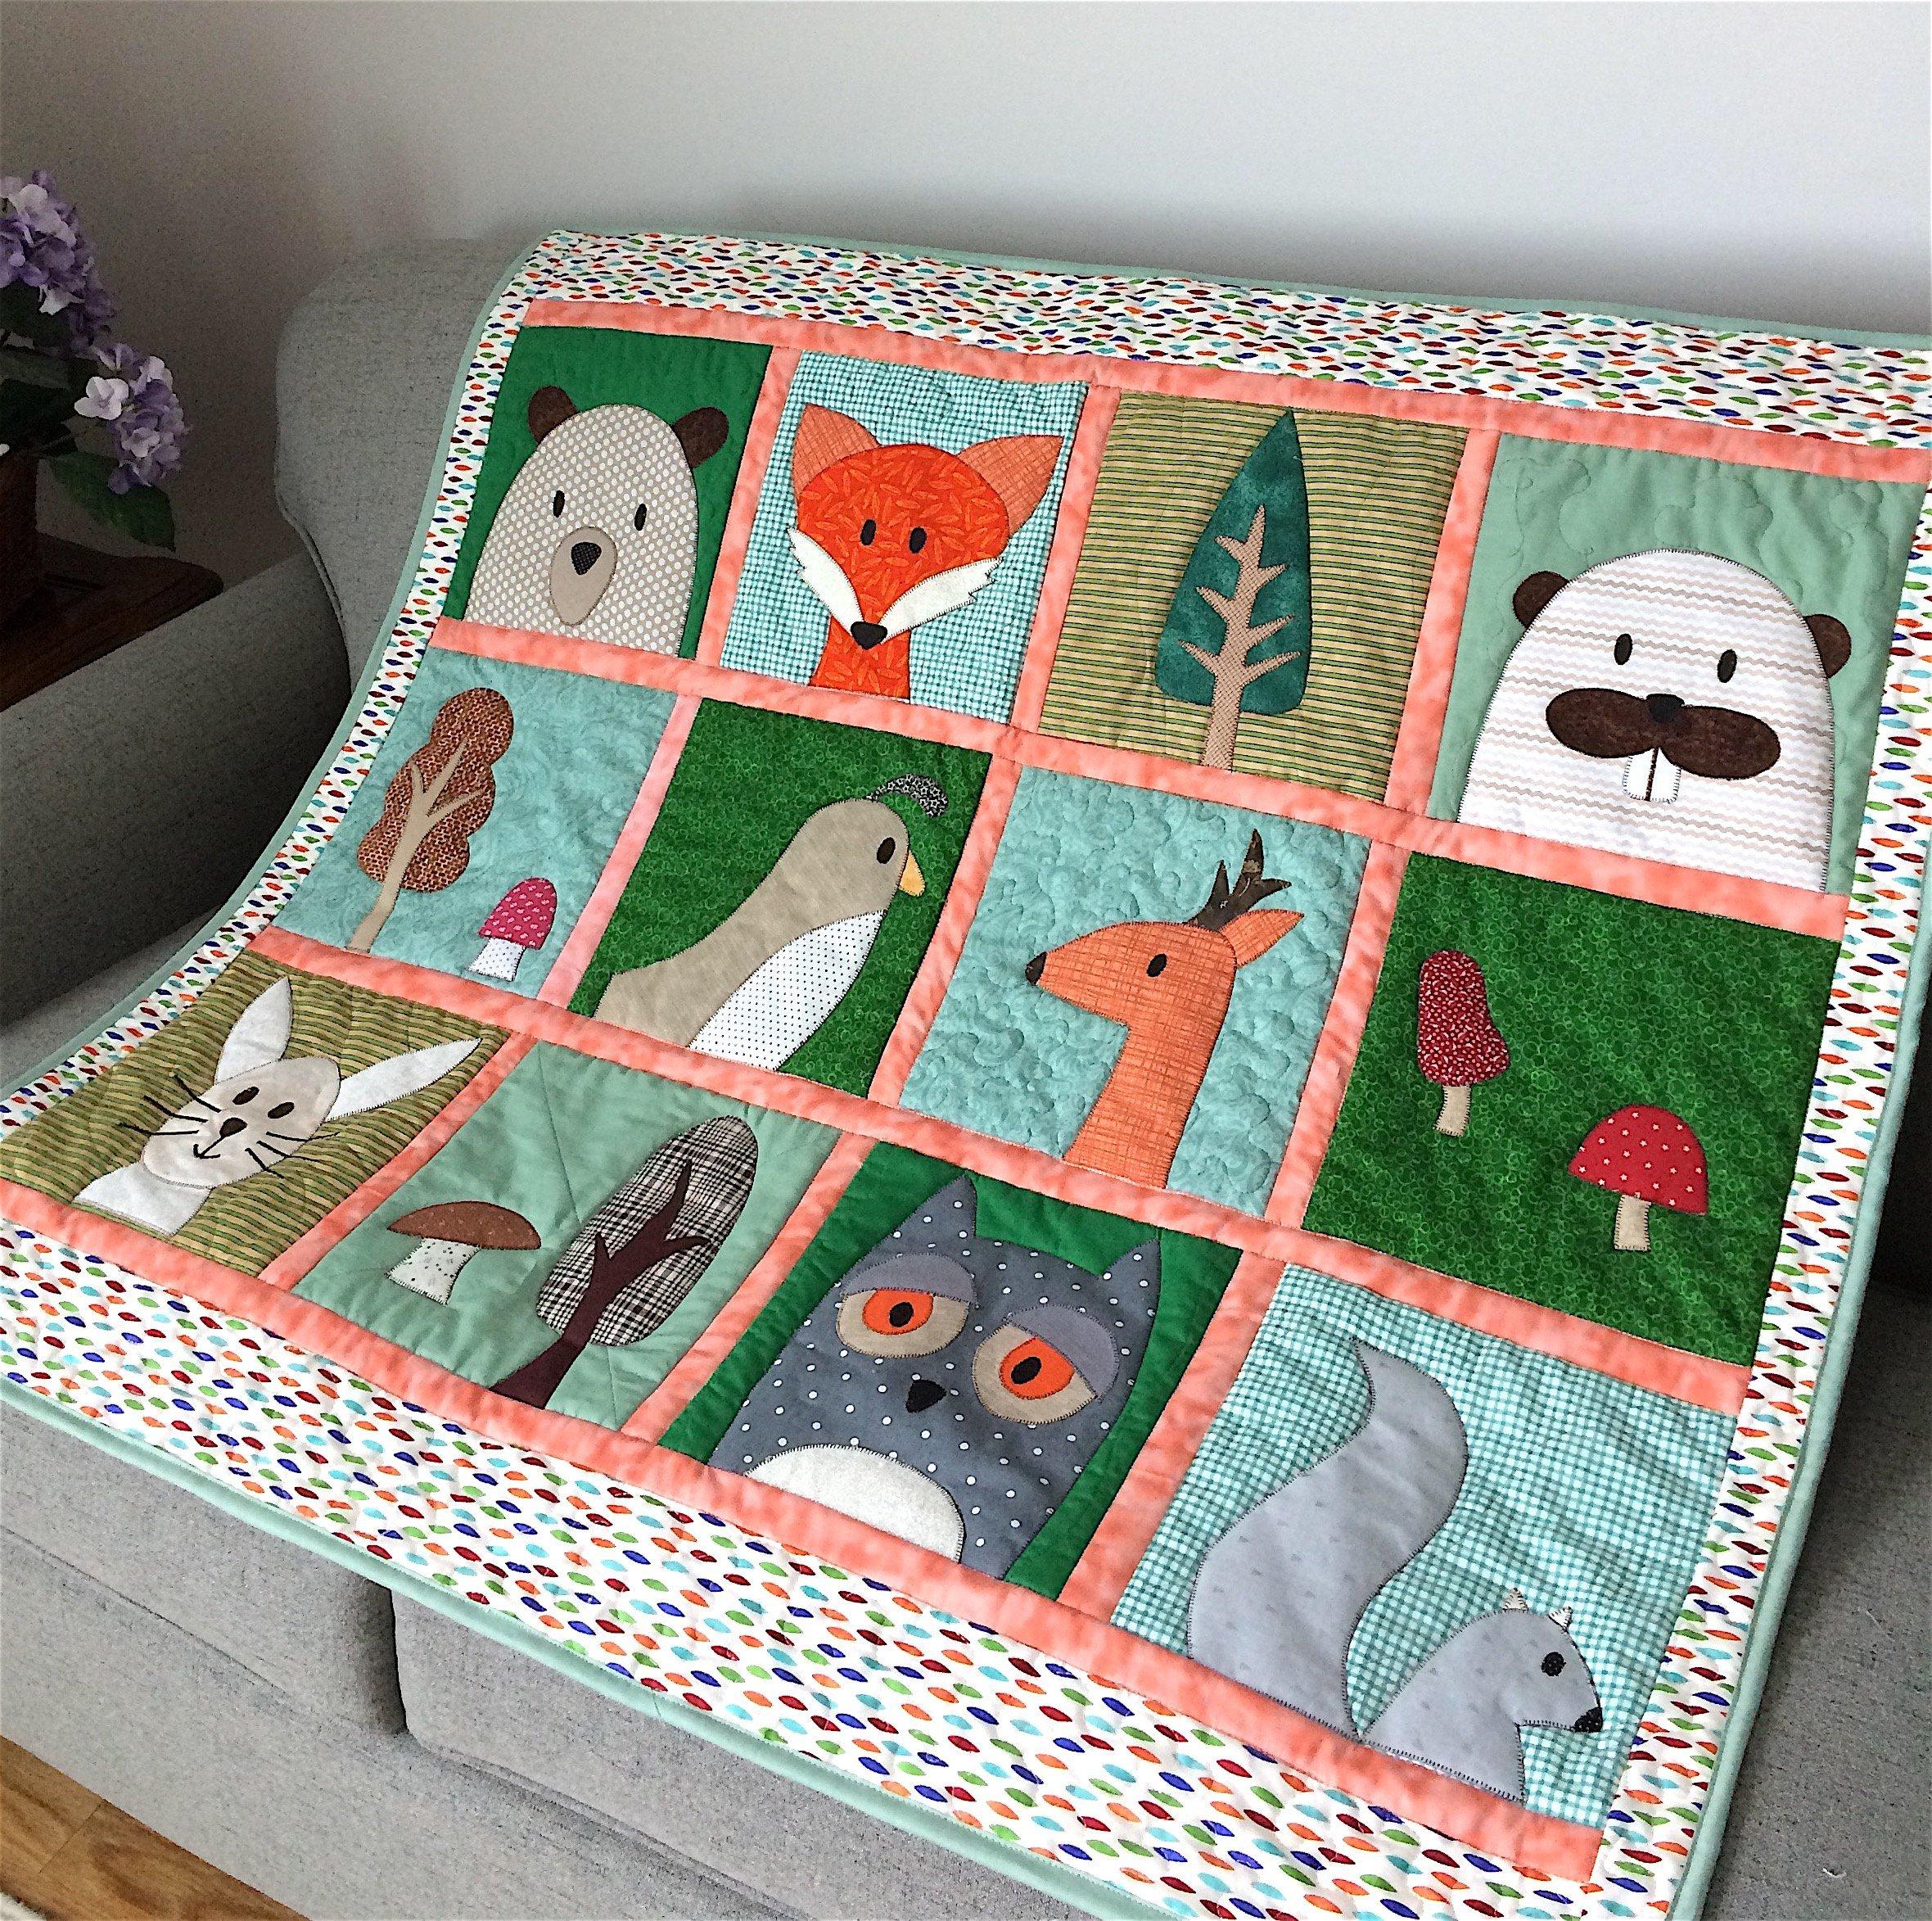 Woodland Baby Quilt, Forest Animals, Fox, Bear, Deer, Toddler Blanket, Nursery Bedding